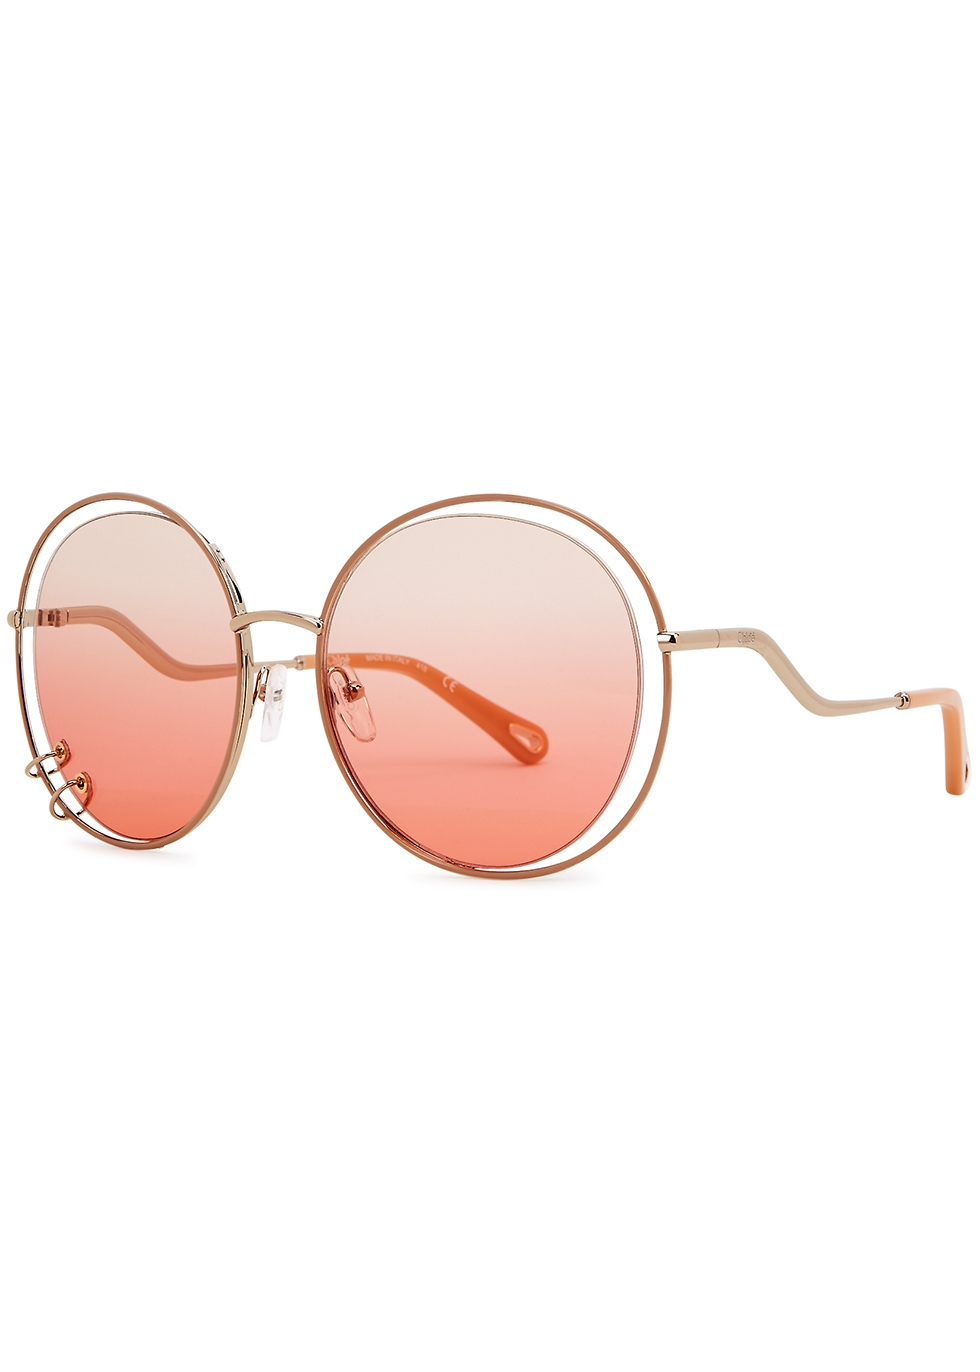 09d428d668b Chloé Sunglasses - Womens - Harvey Nichols